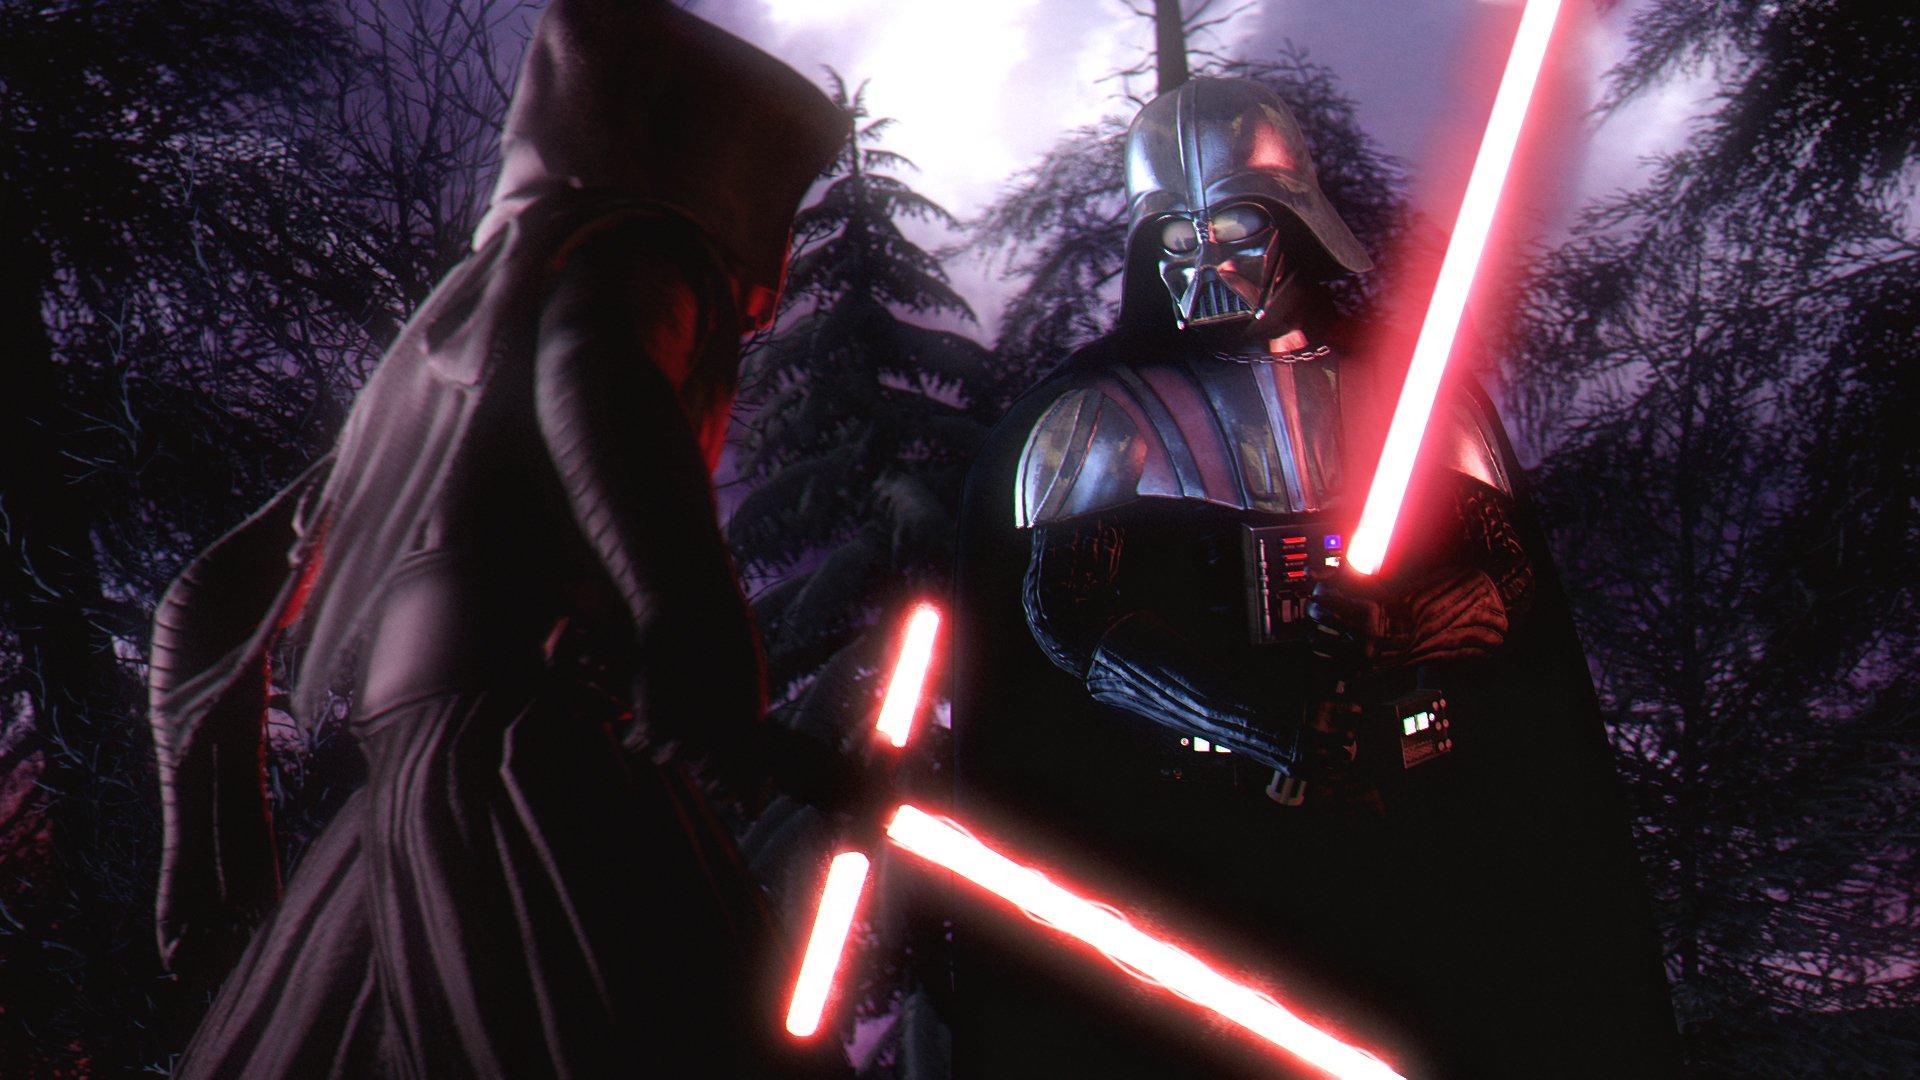 Star Wars Hd Wallpaper Background Image 1920x1080 Id 774769